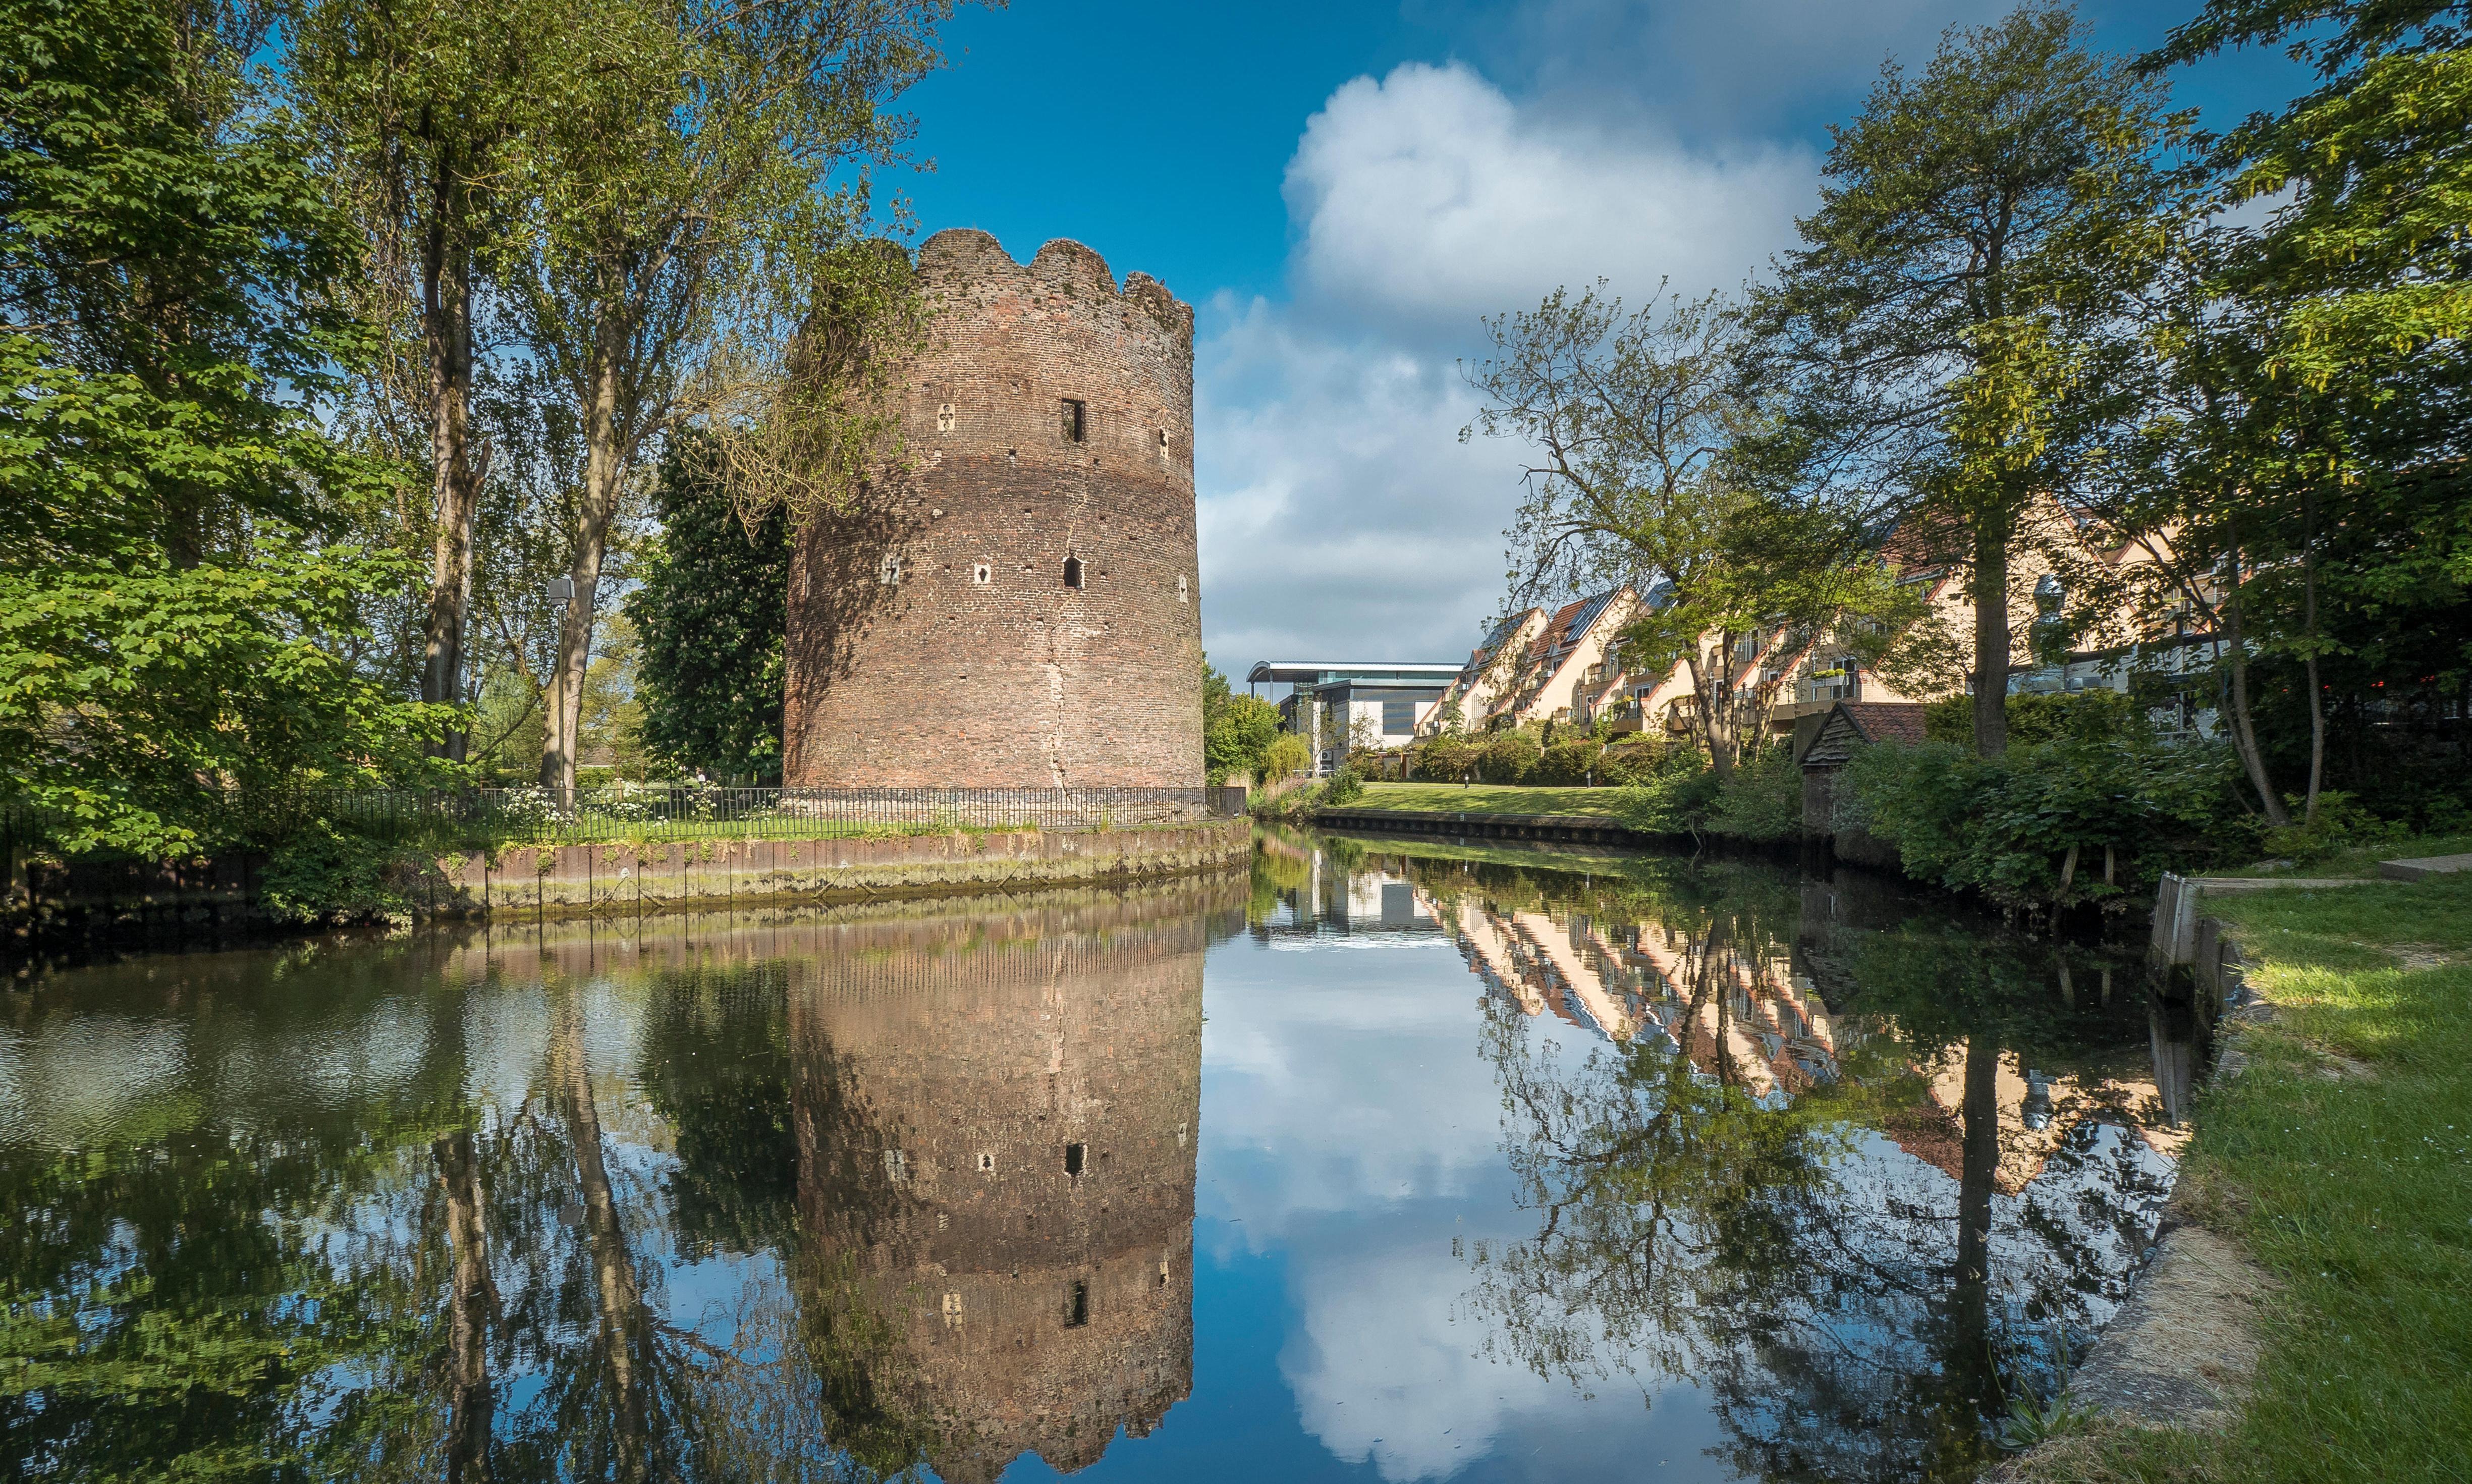 Radicalism, rebellion and Robert Kett: a walk through Norwich's history